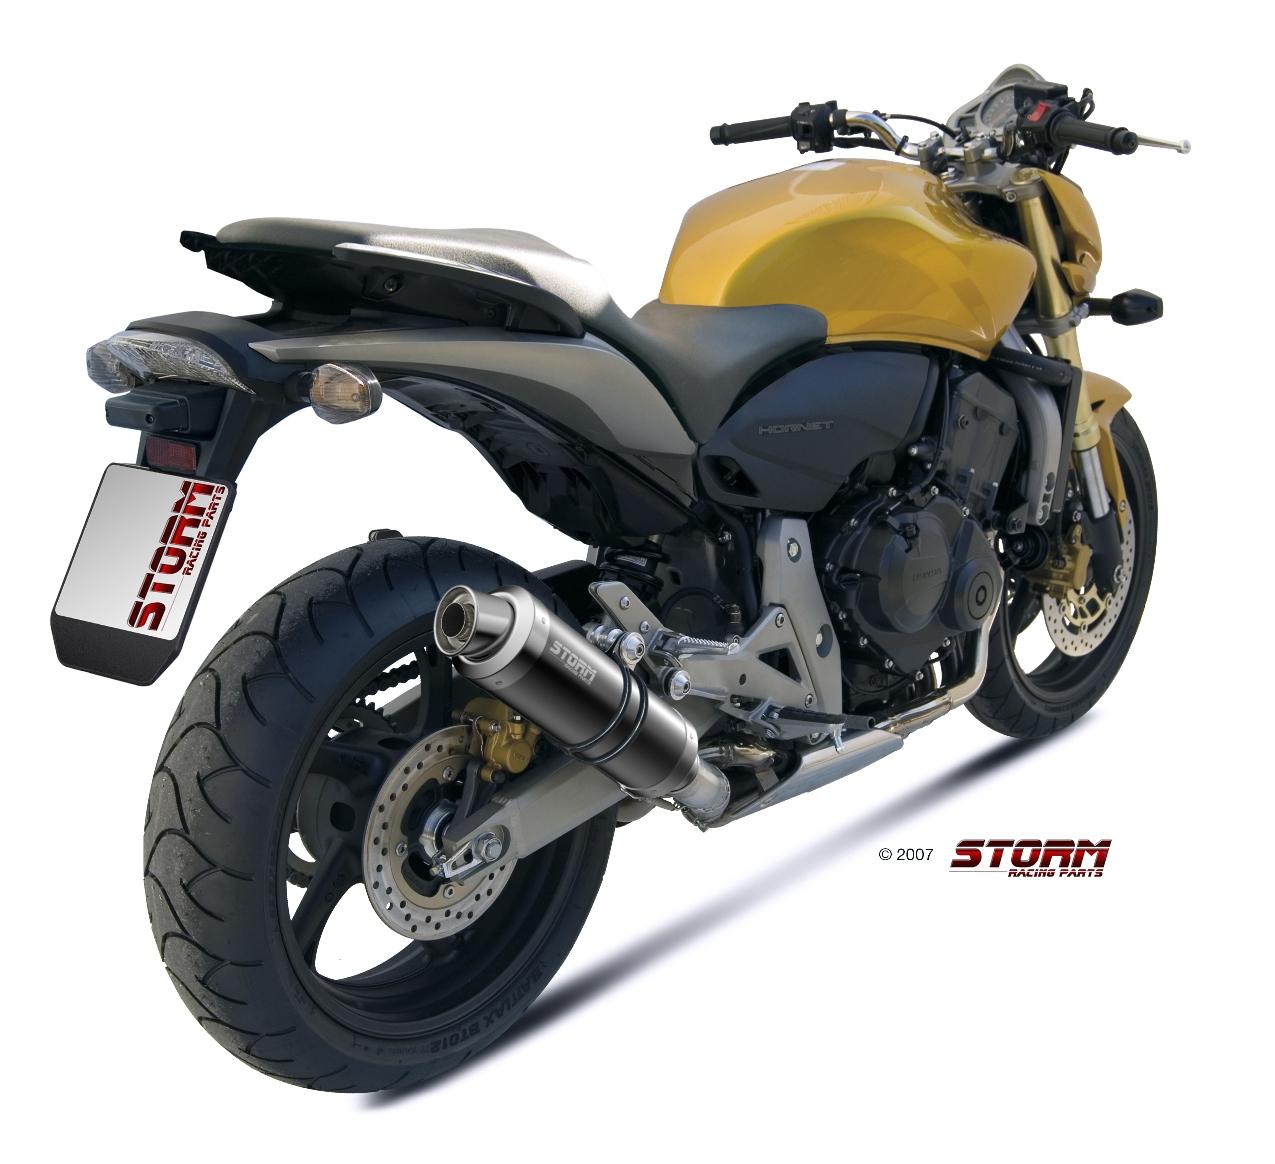 Scarico Honda HORNET 600 Storm Gp Inox negro 74.H.038.LXSB